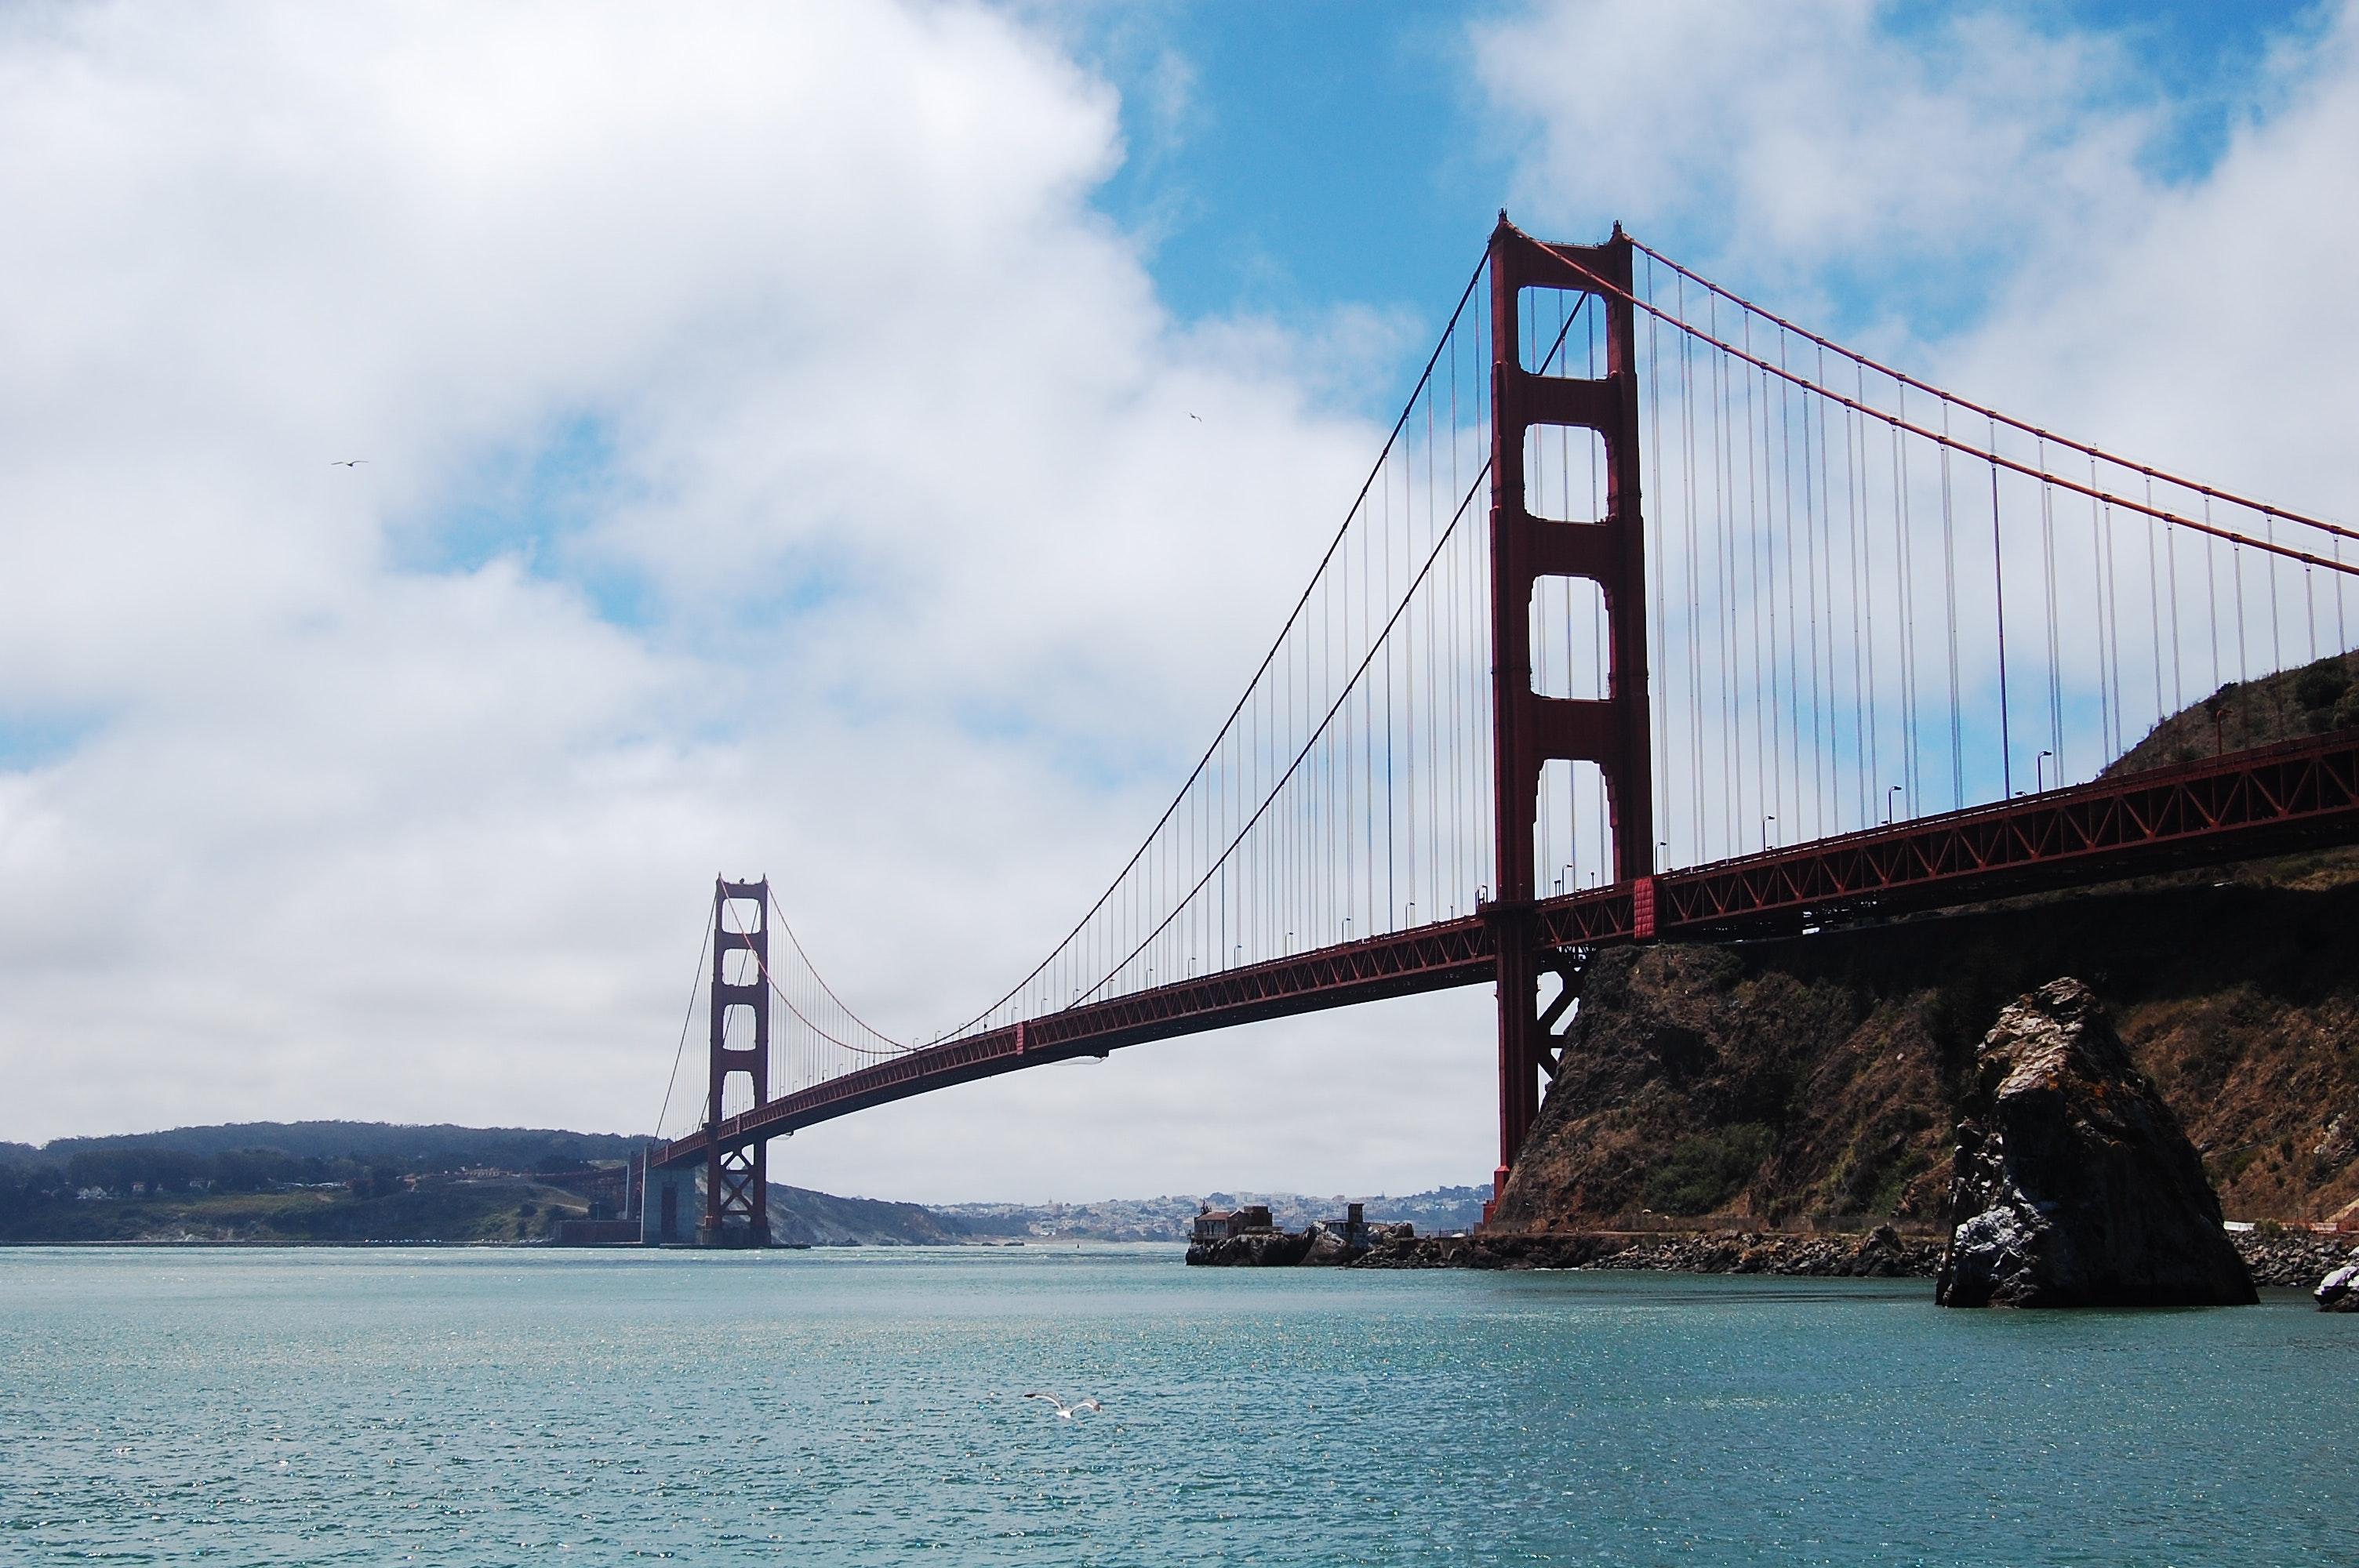 Golden gate bridge during daytime photo